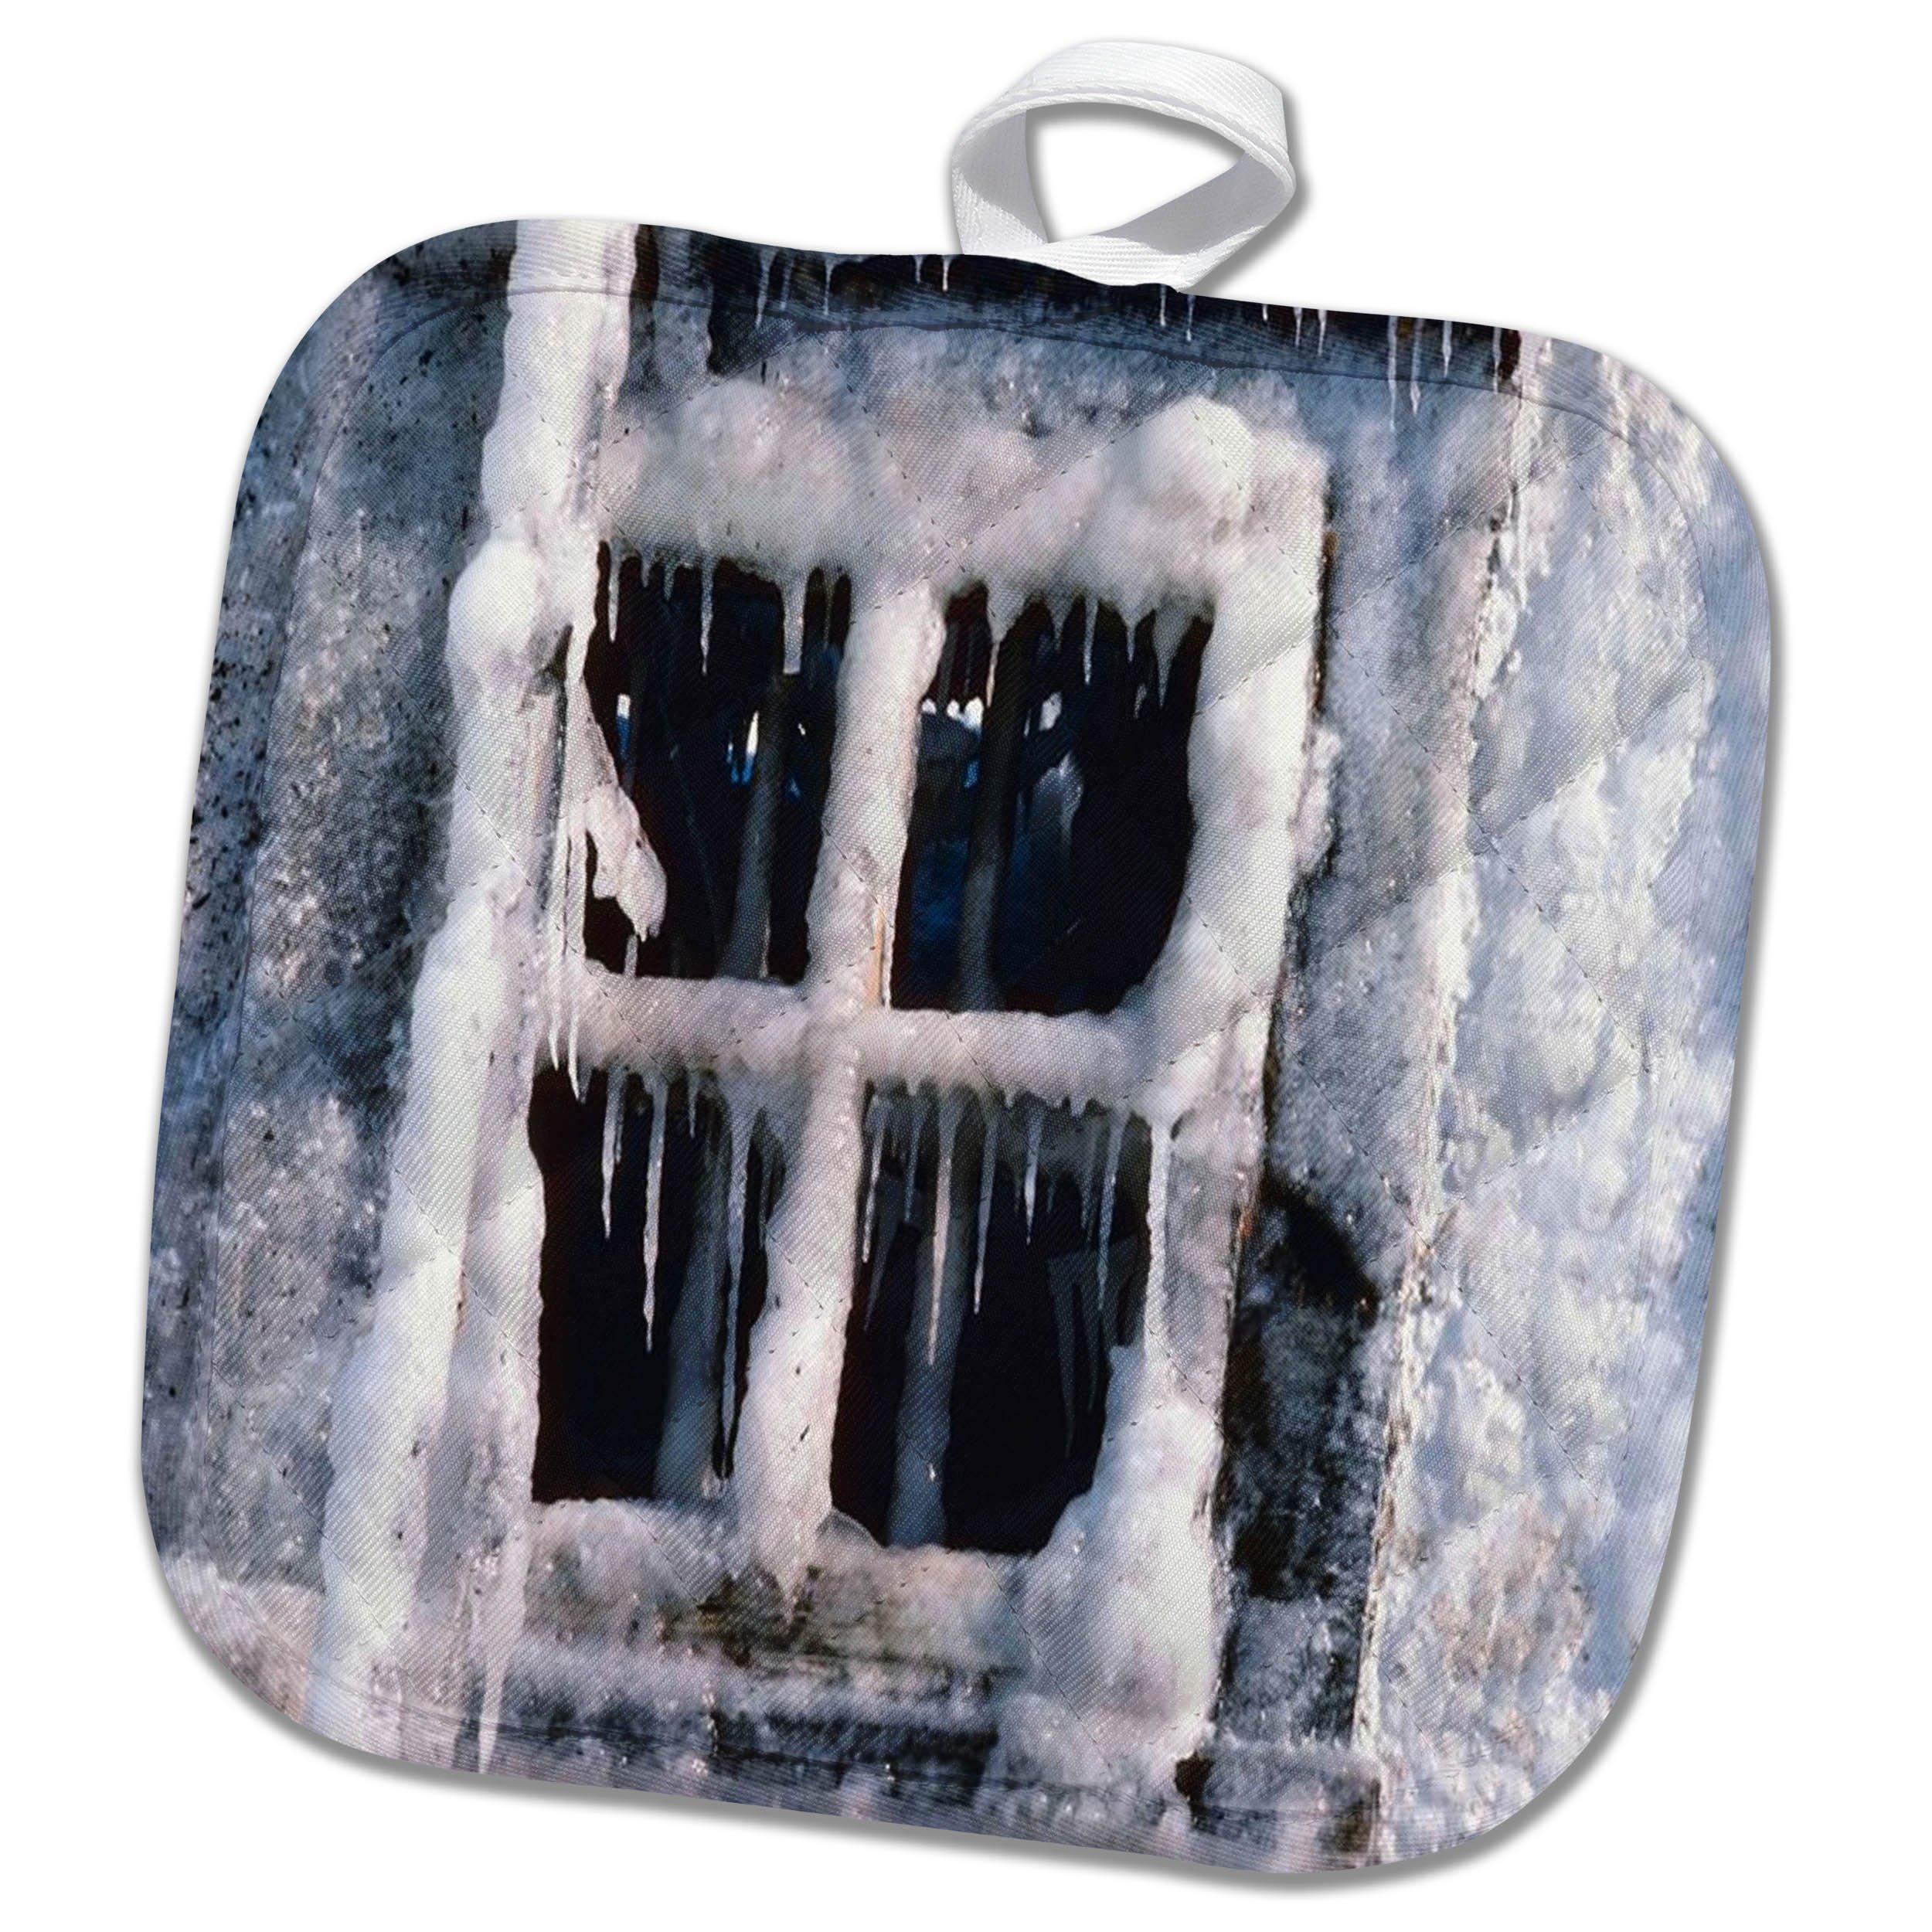 3dRose TDSwhite – Winter Seasonal Nature Photos - Snowed In Window - 8x8 Potholder (phl_284914_1)